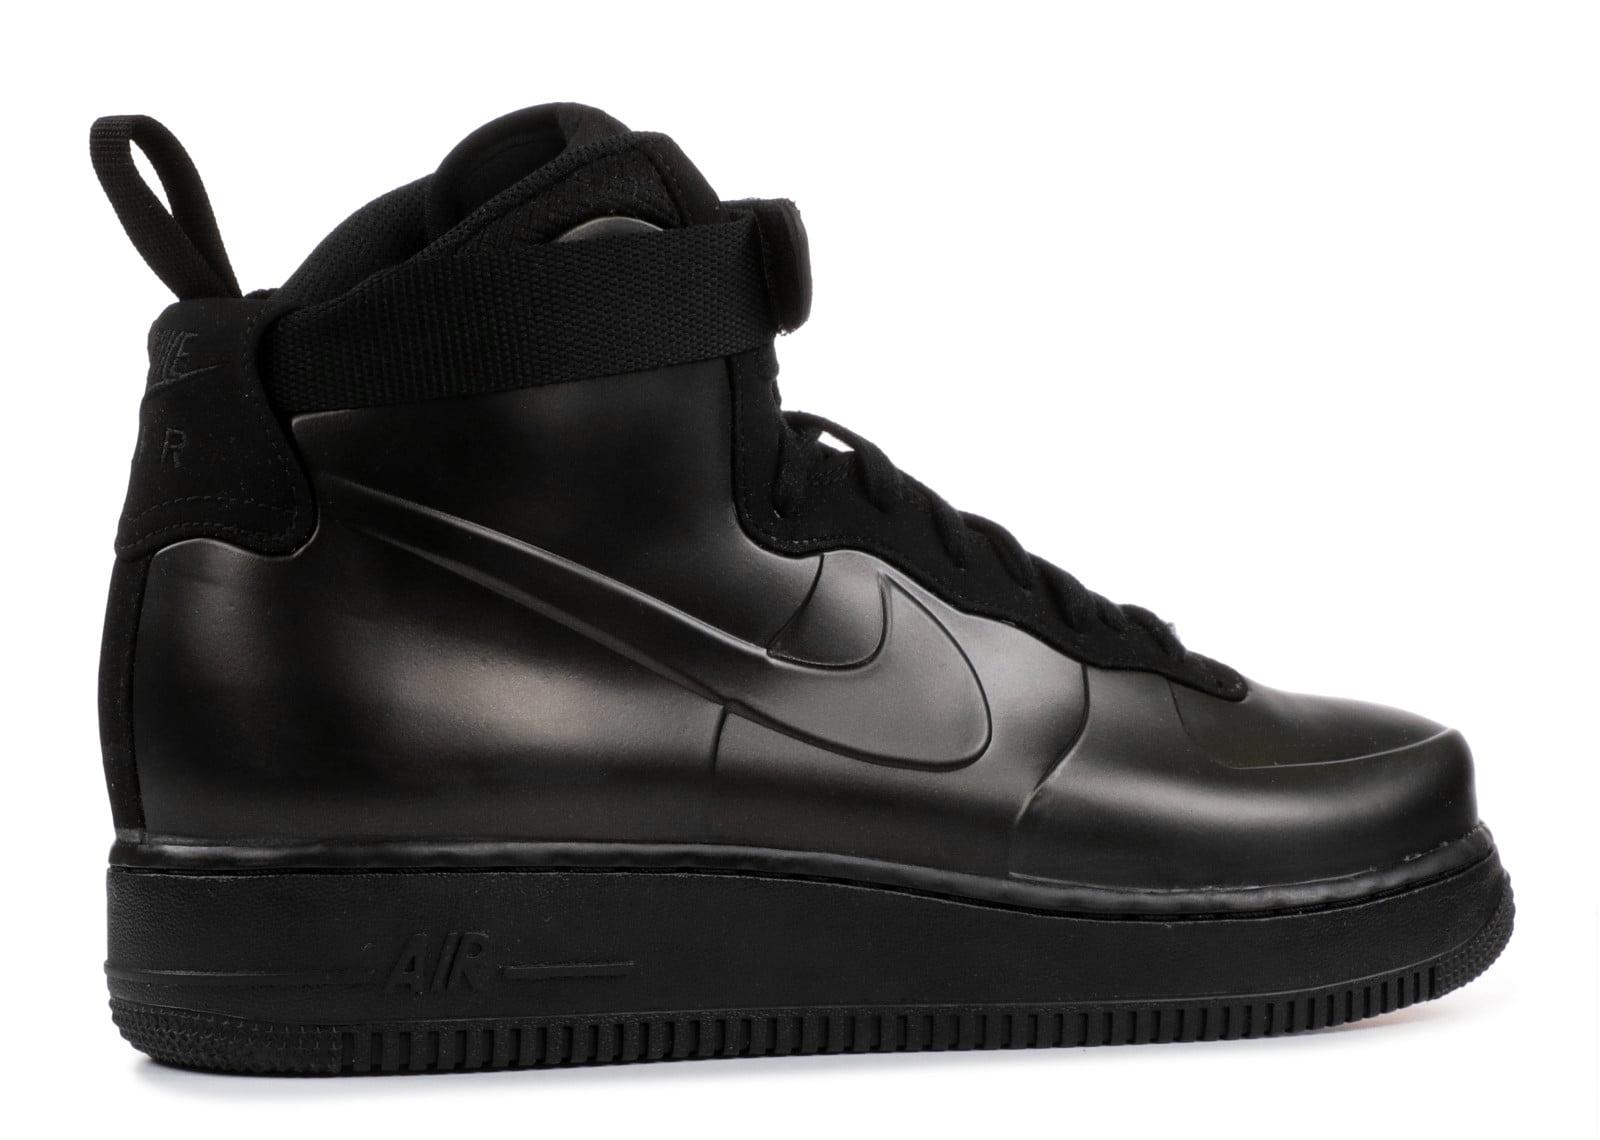 38eca26f089 Nike - Men - Air Force 1 Foamposite Cup  Triple Black  - Ah6771-001 - Size  13